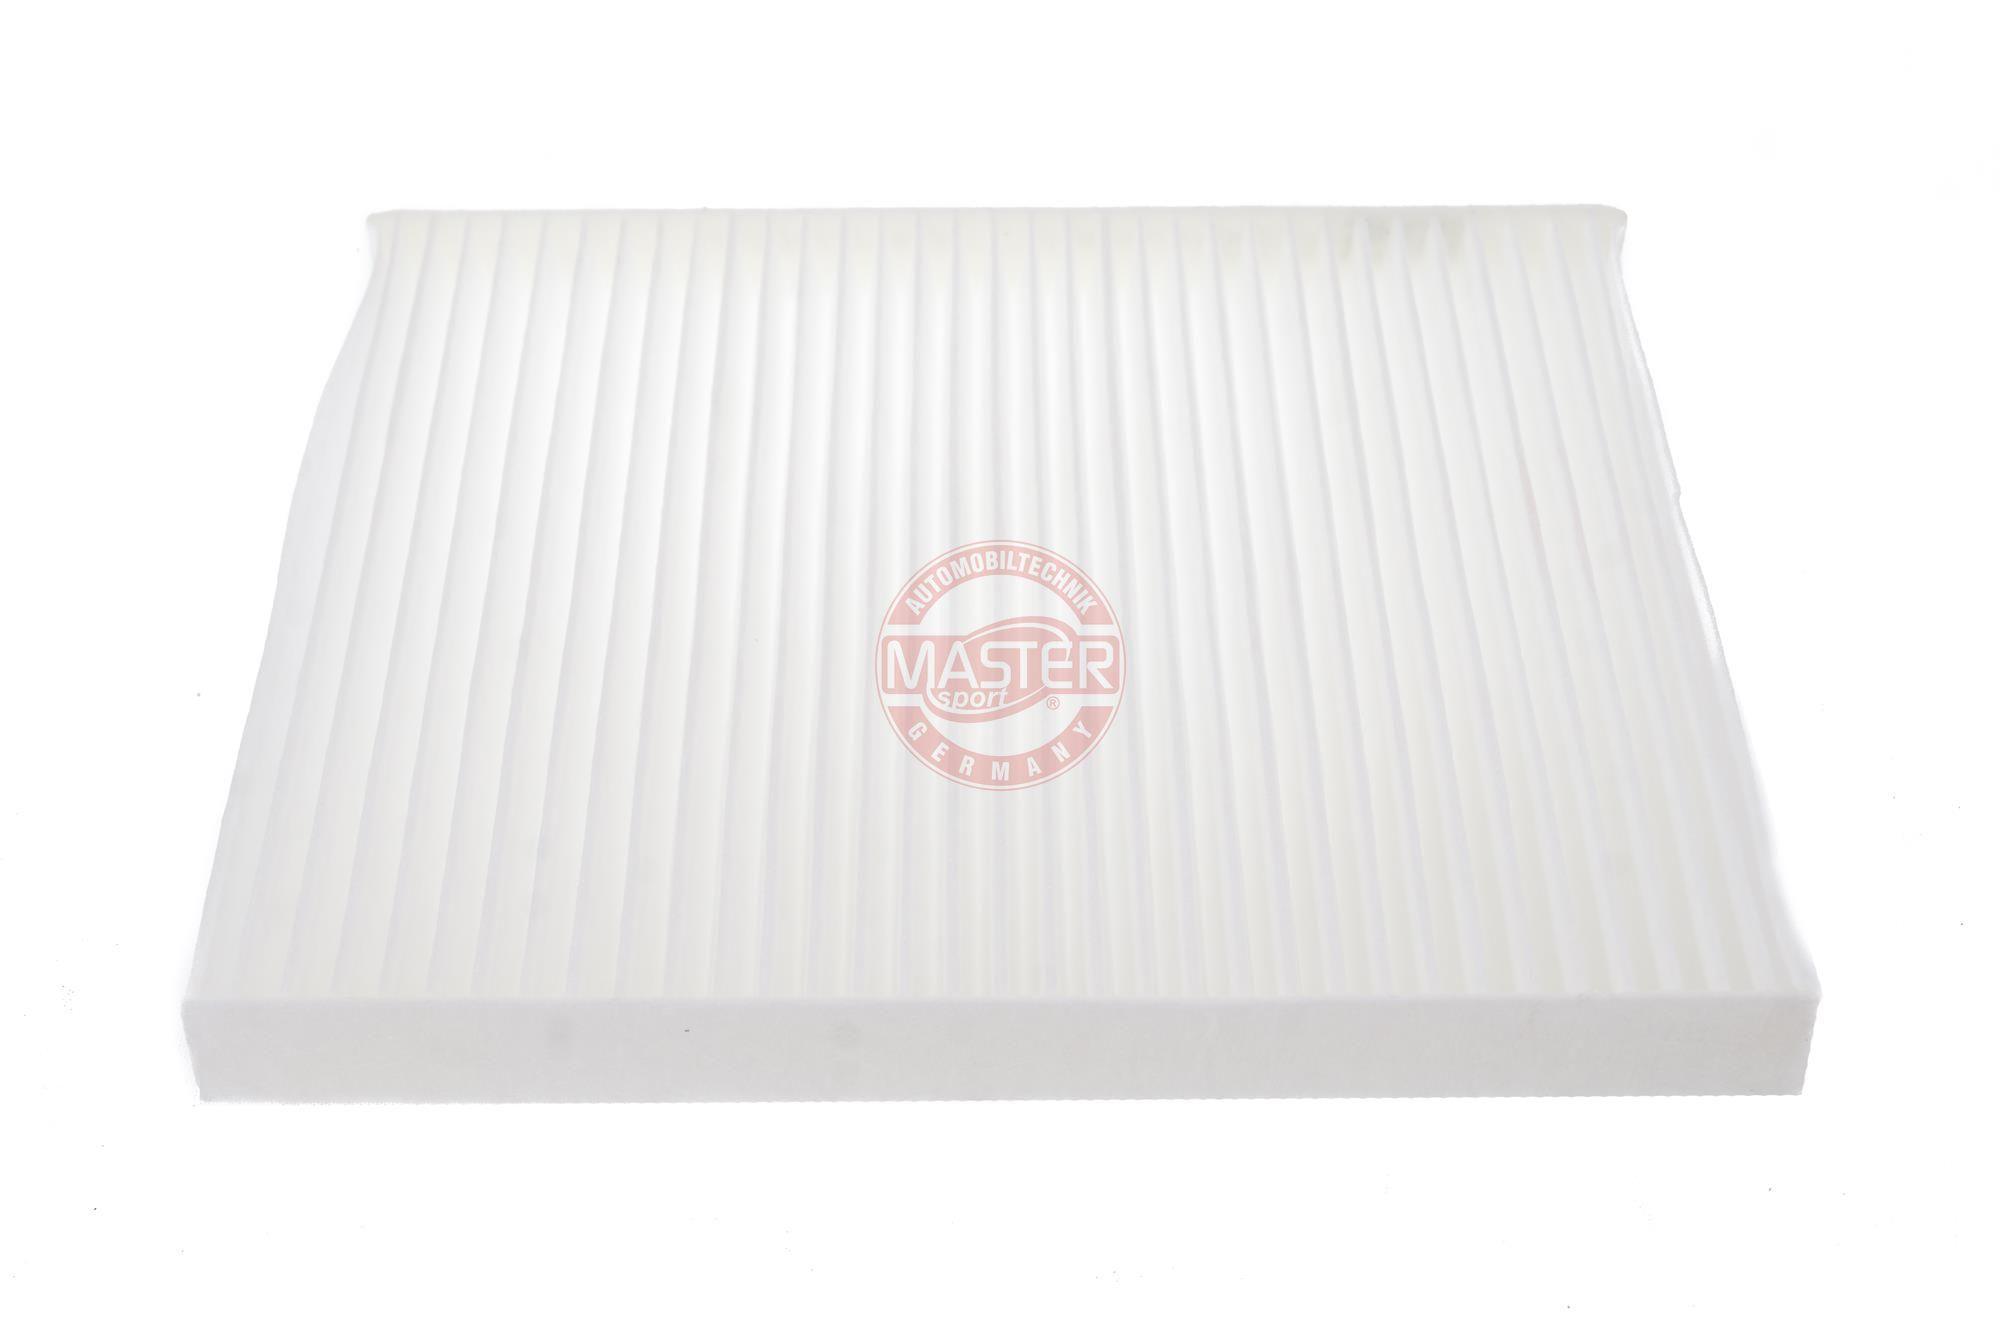 Staubfilter MASTER-SPORT 420020260 4250083995519